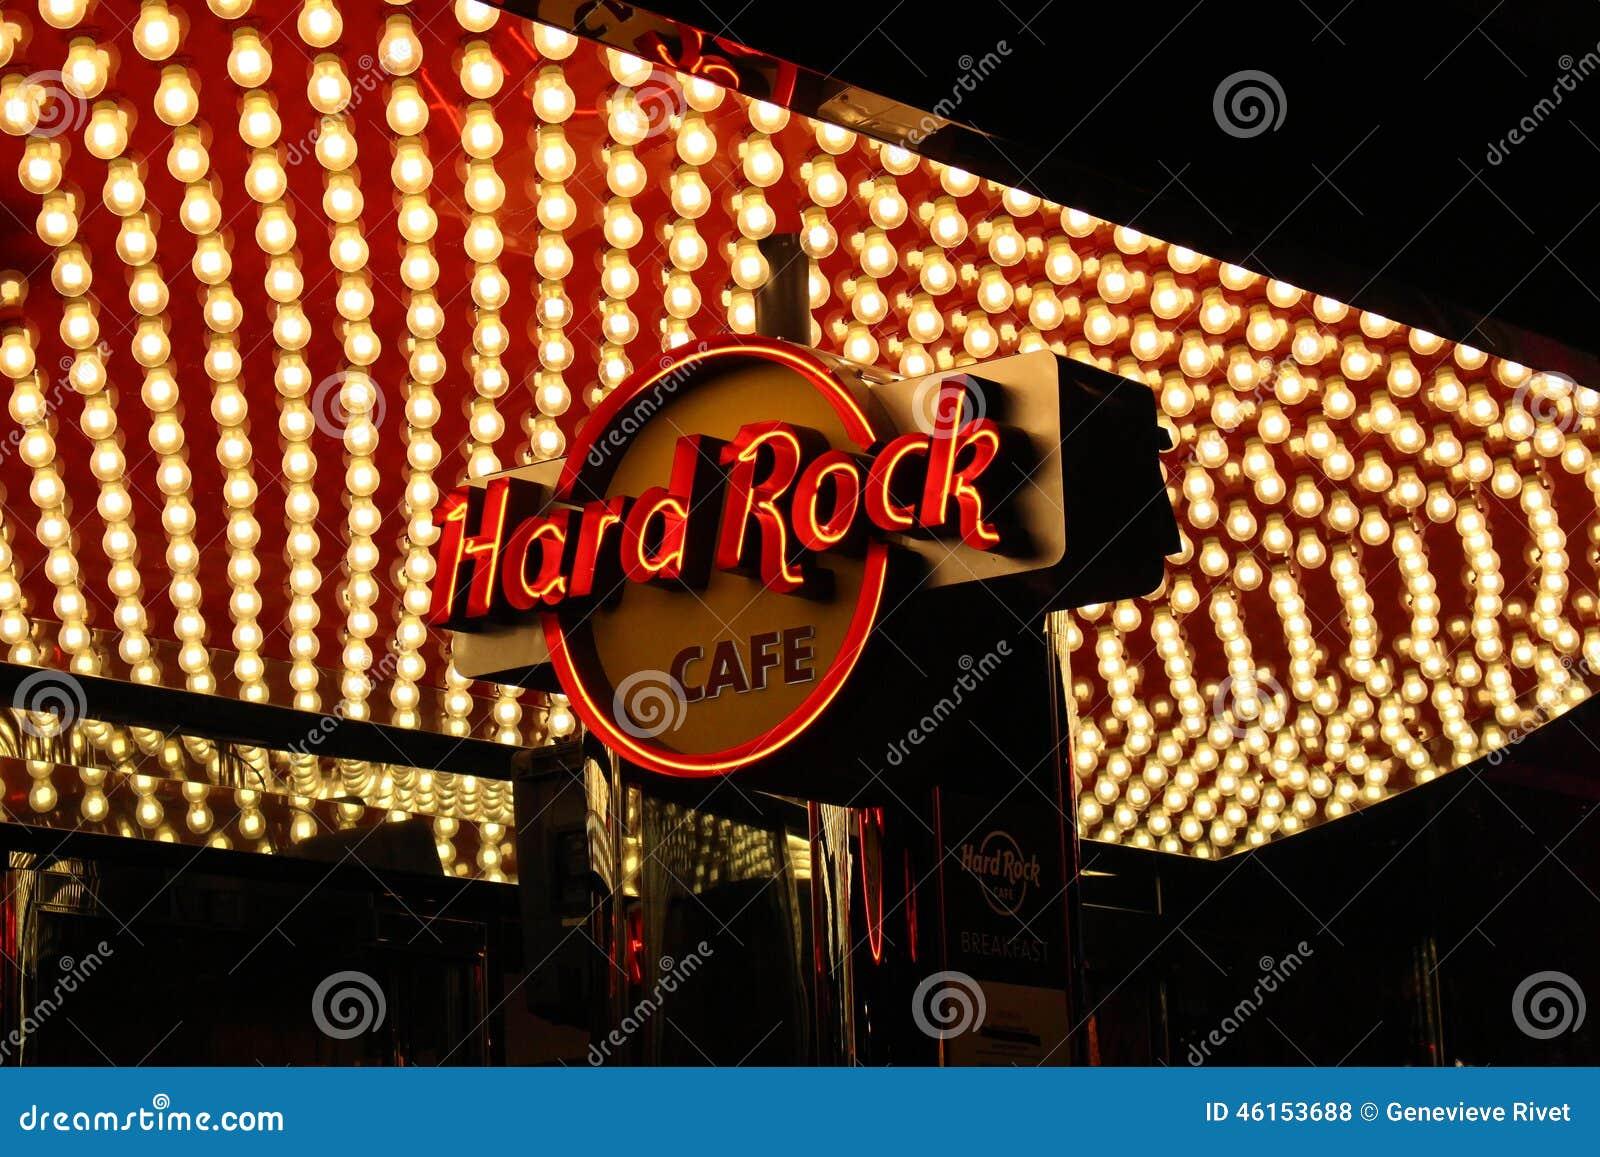 Las Vegas Hard Rock Cafe Restaurant